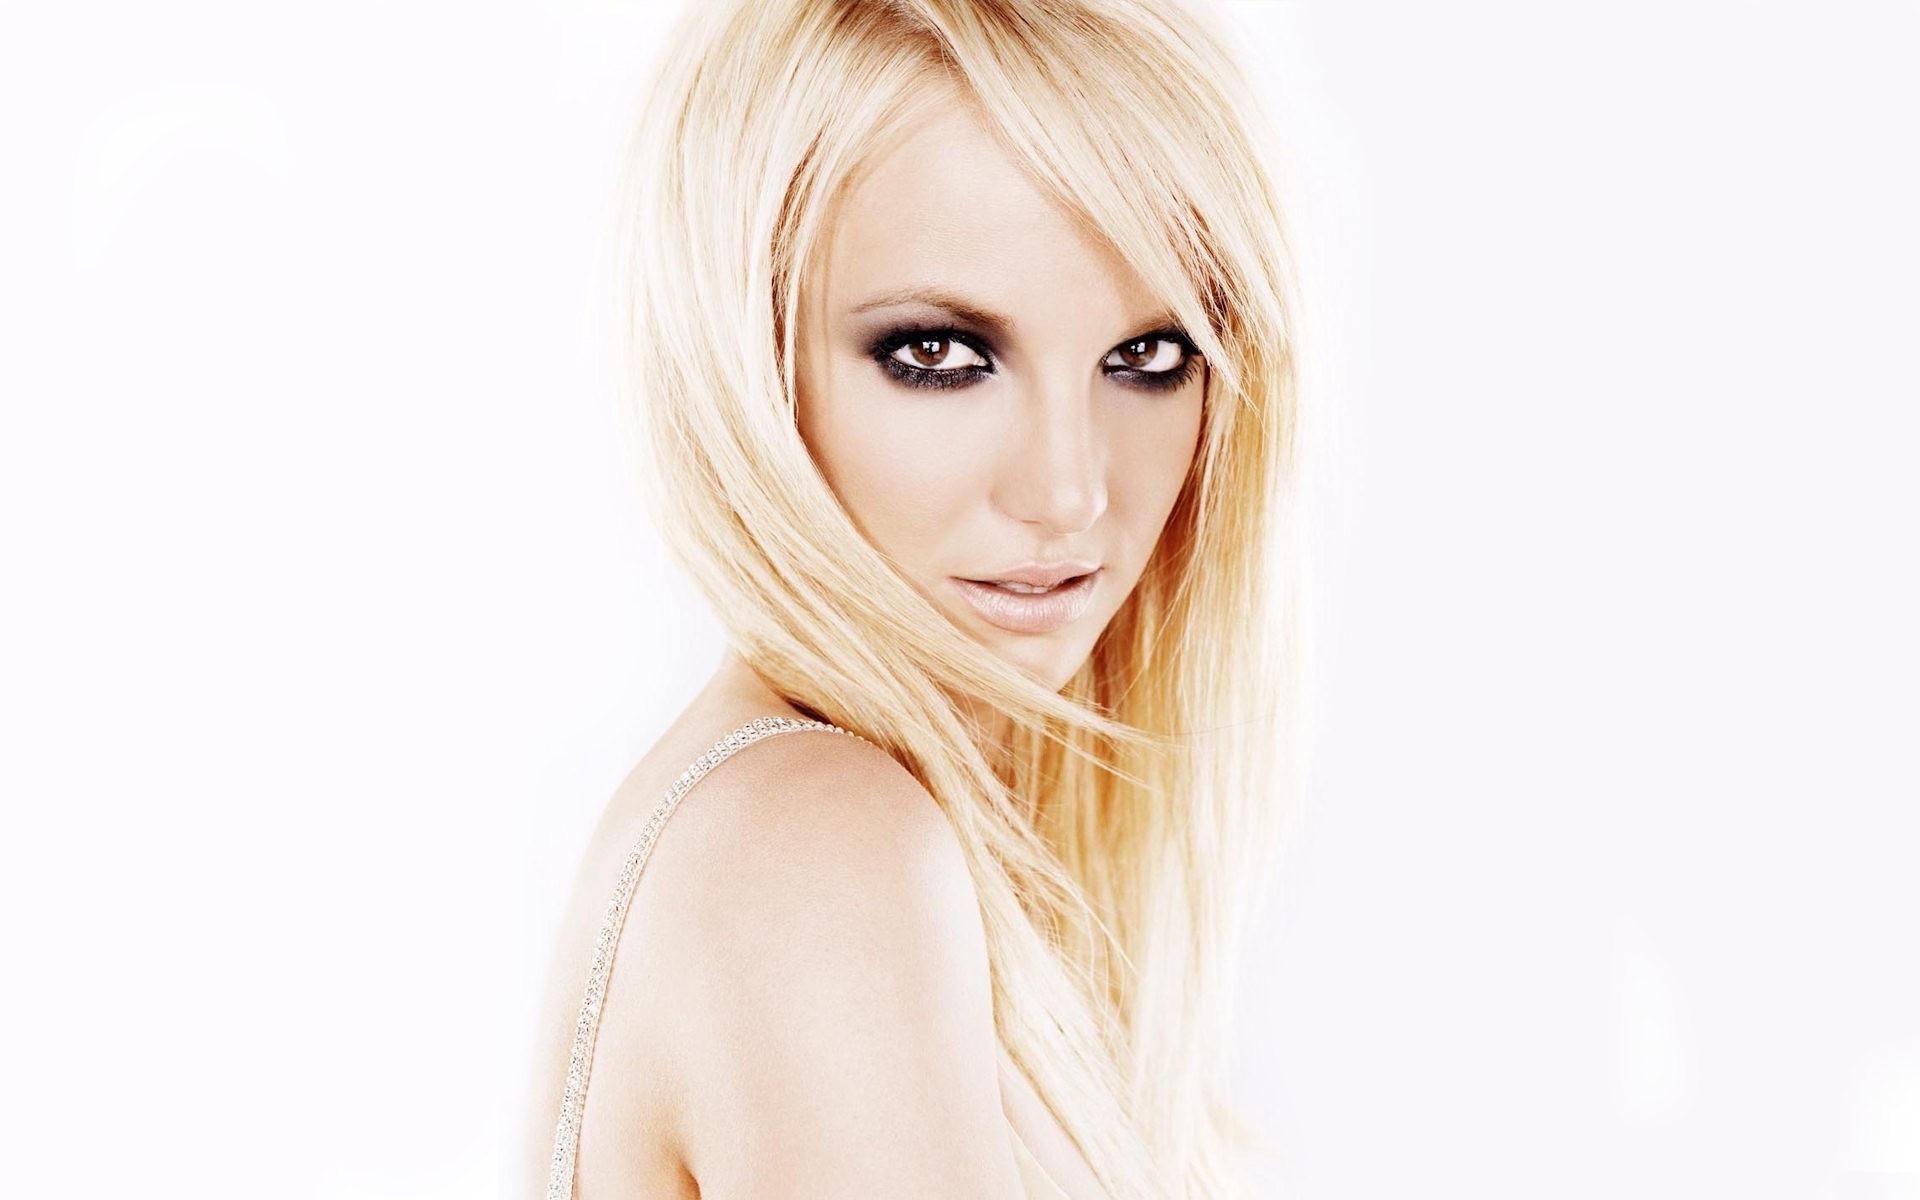 Britney Spears Wallpaper 17